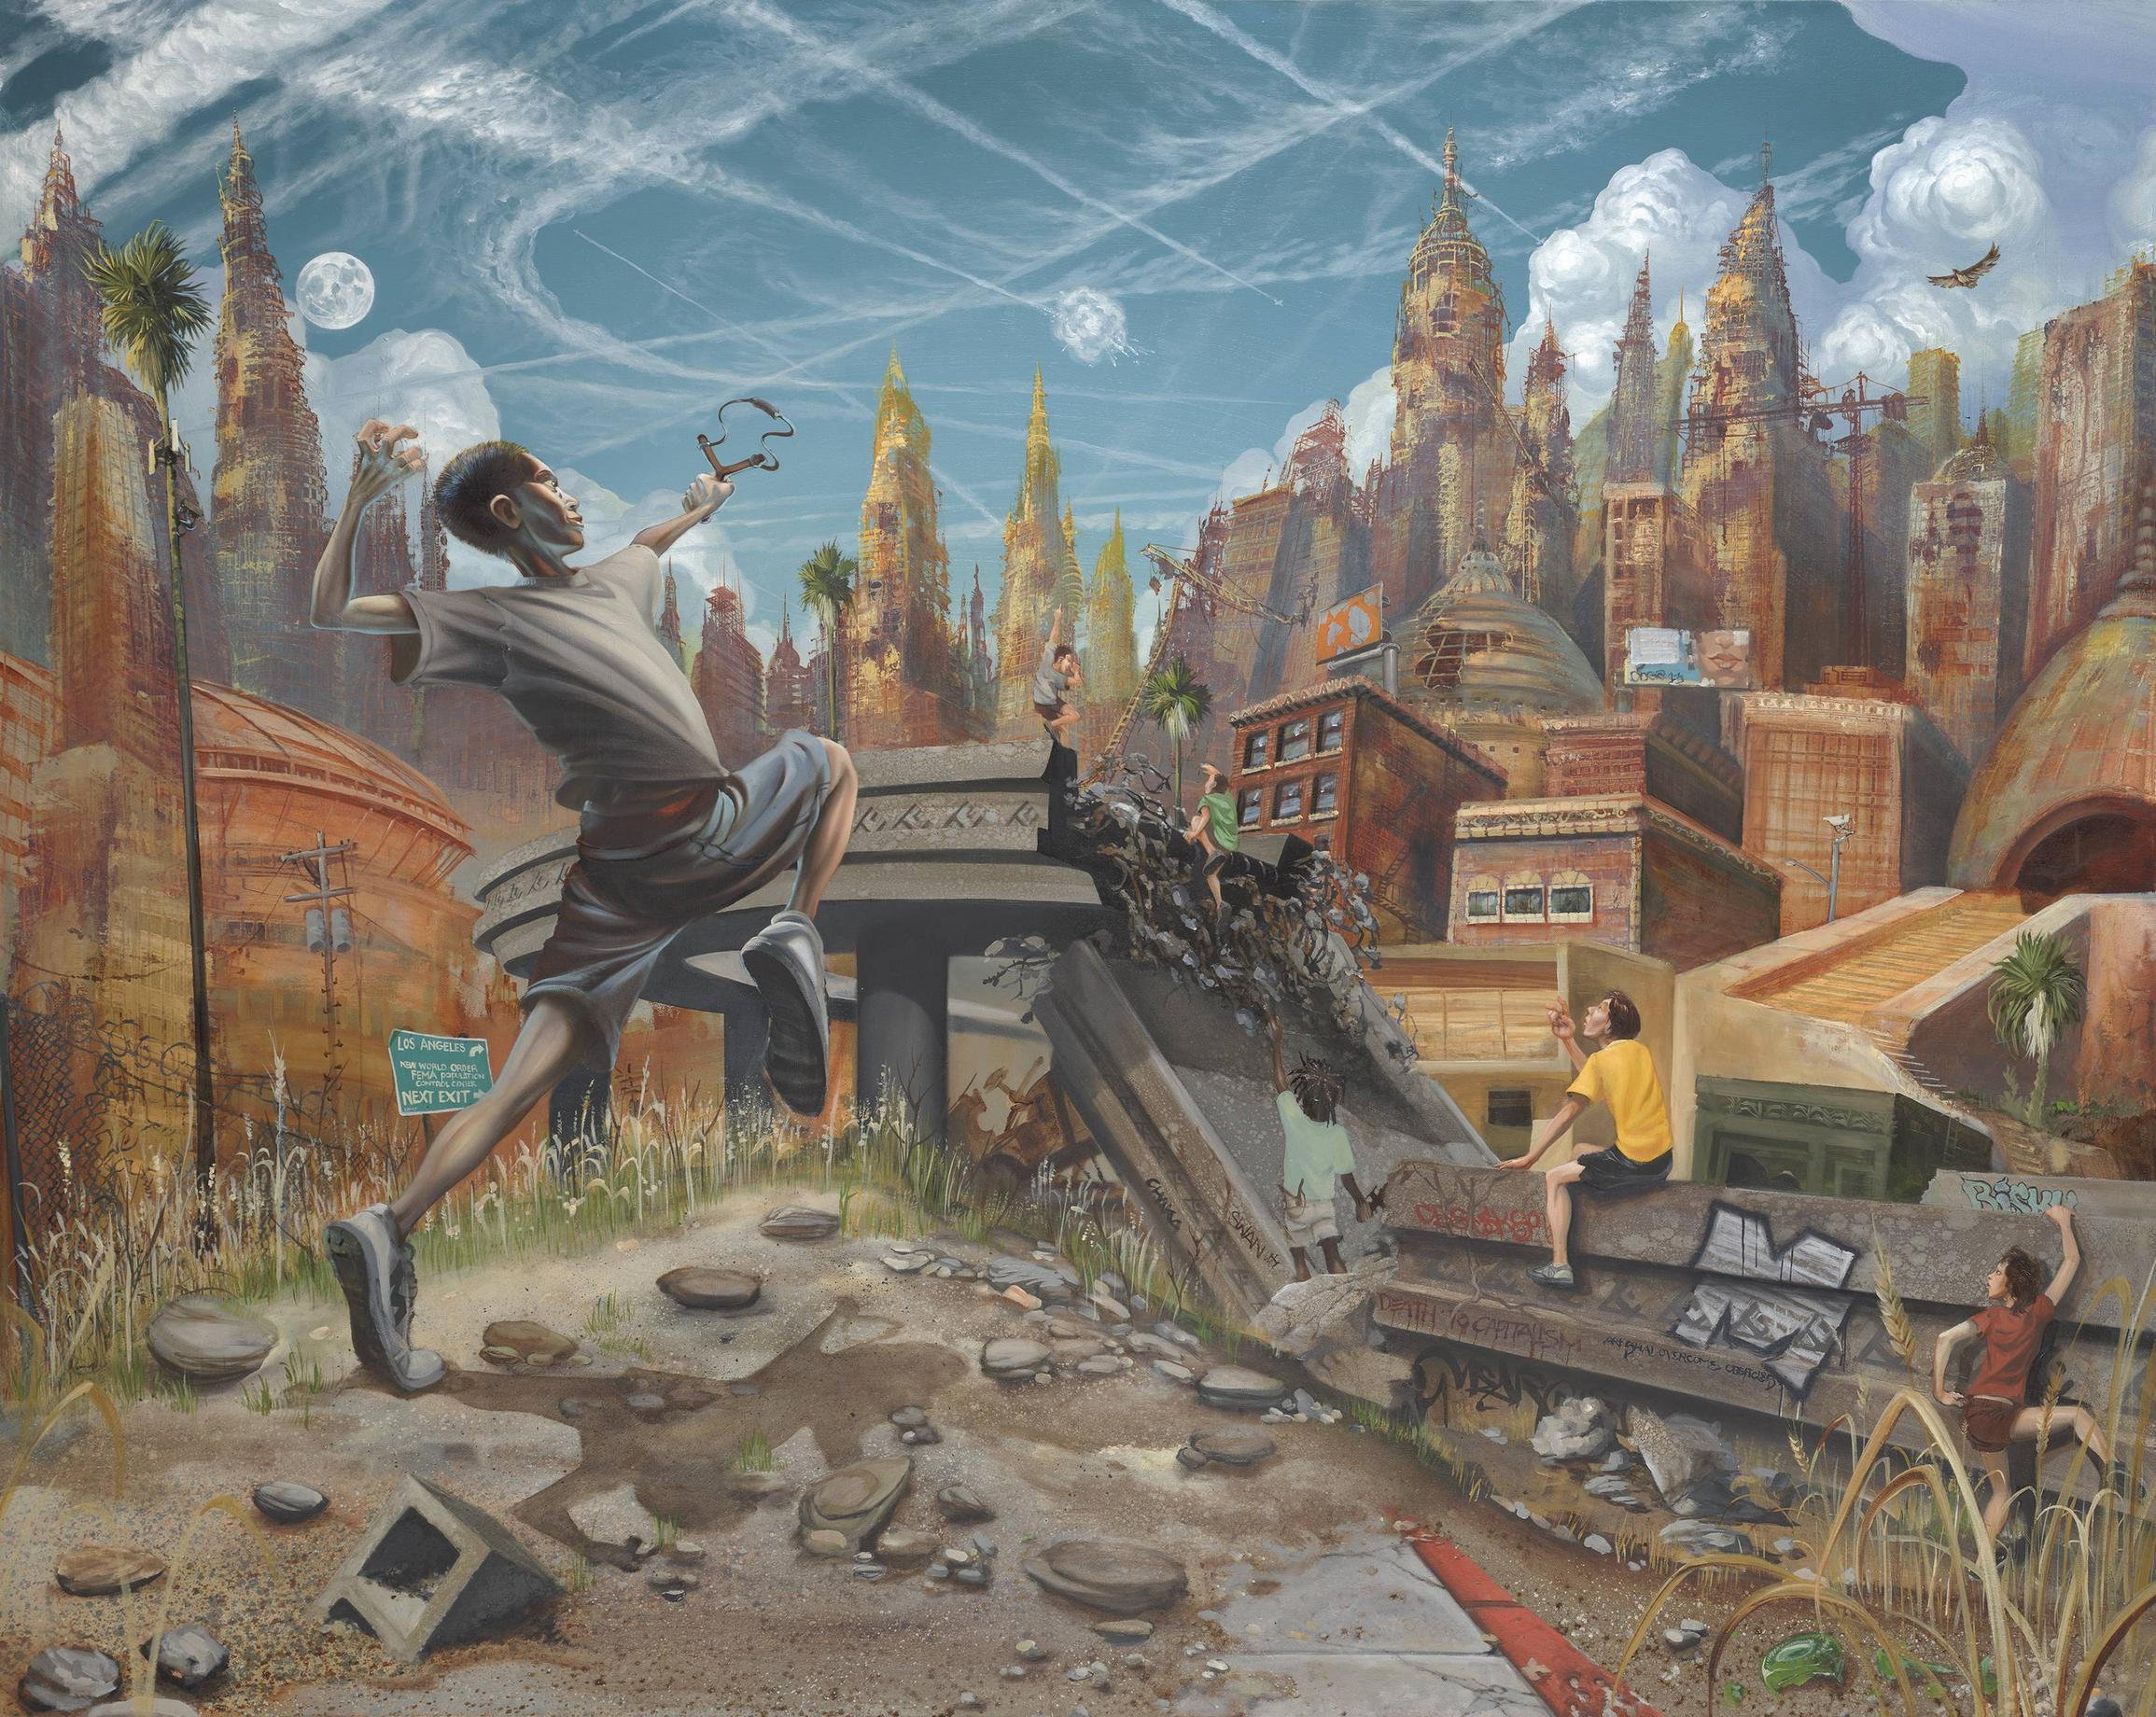 Freeport - David & Goliath 75/100